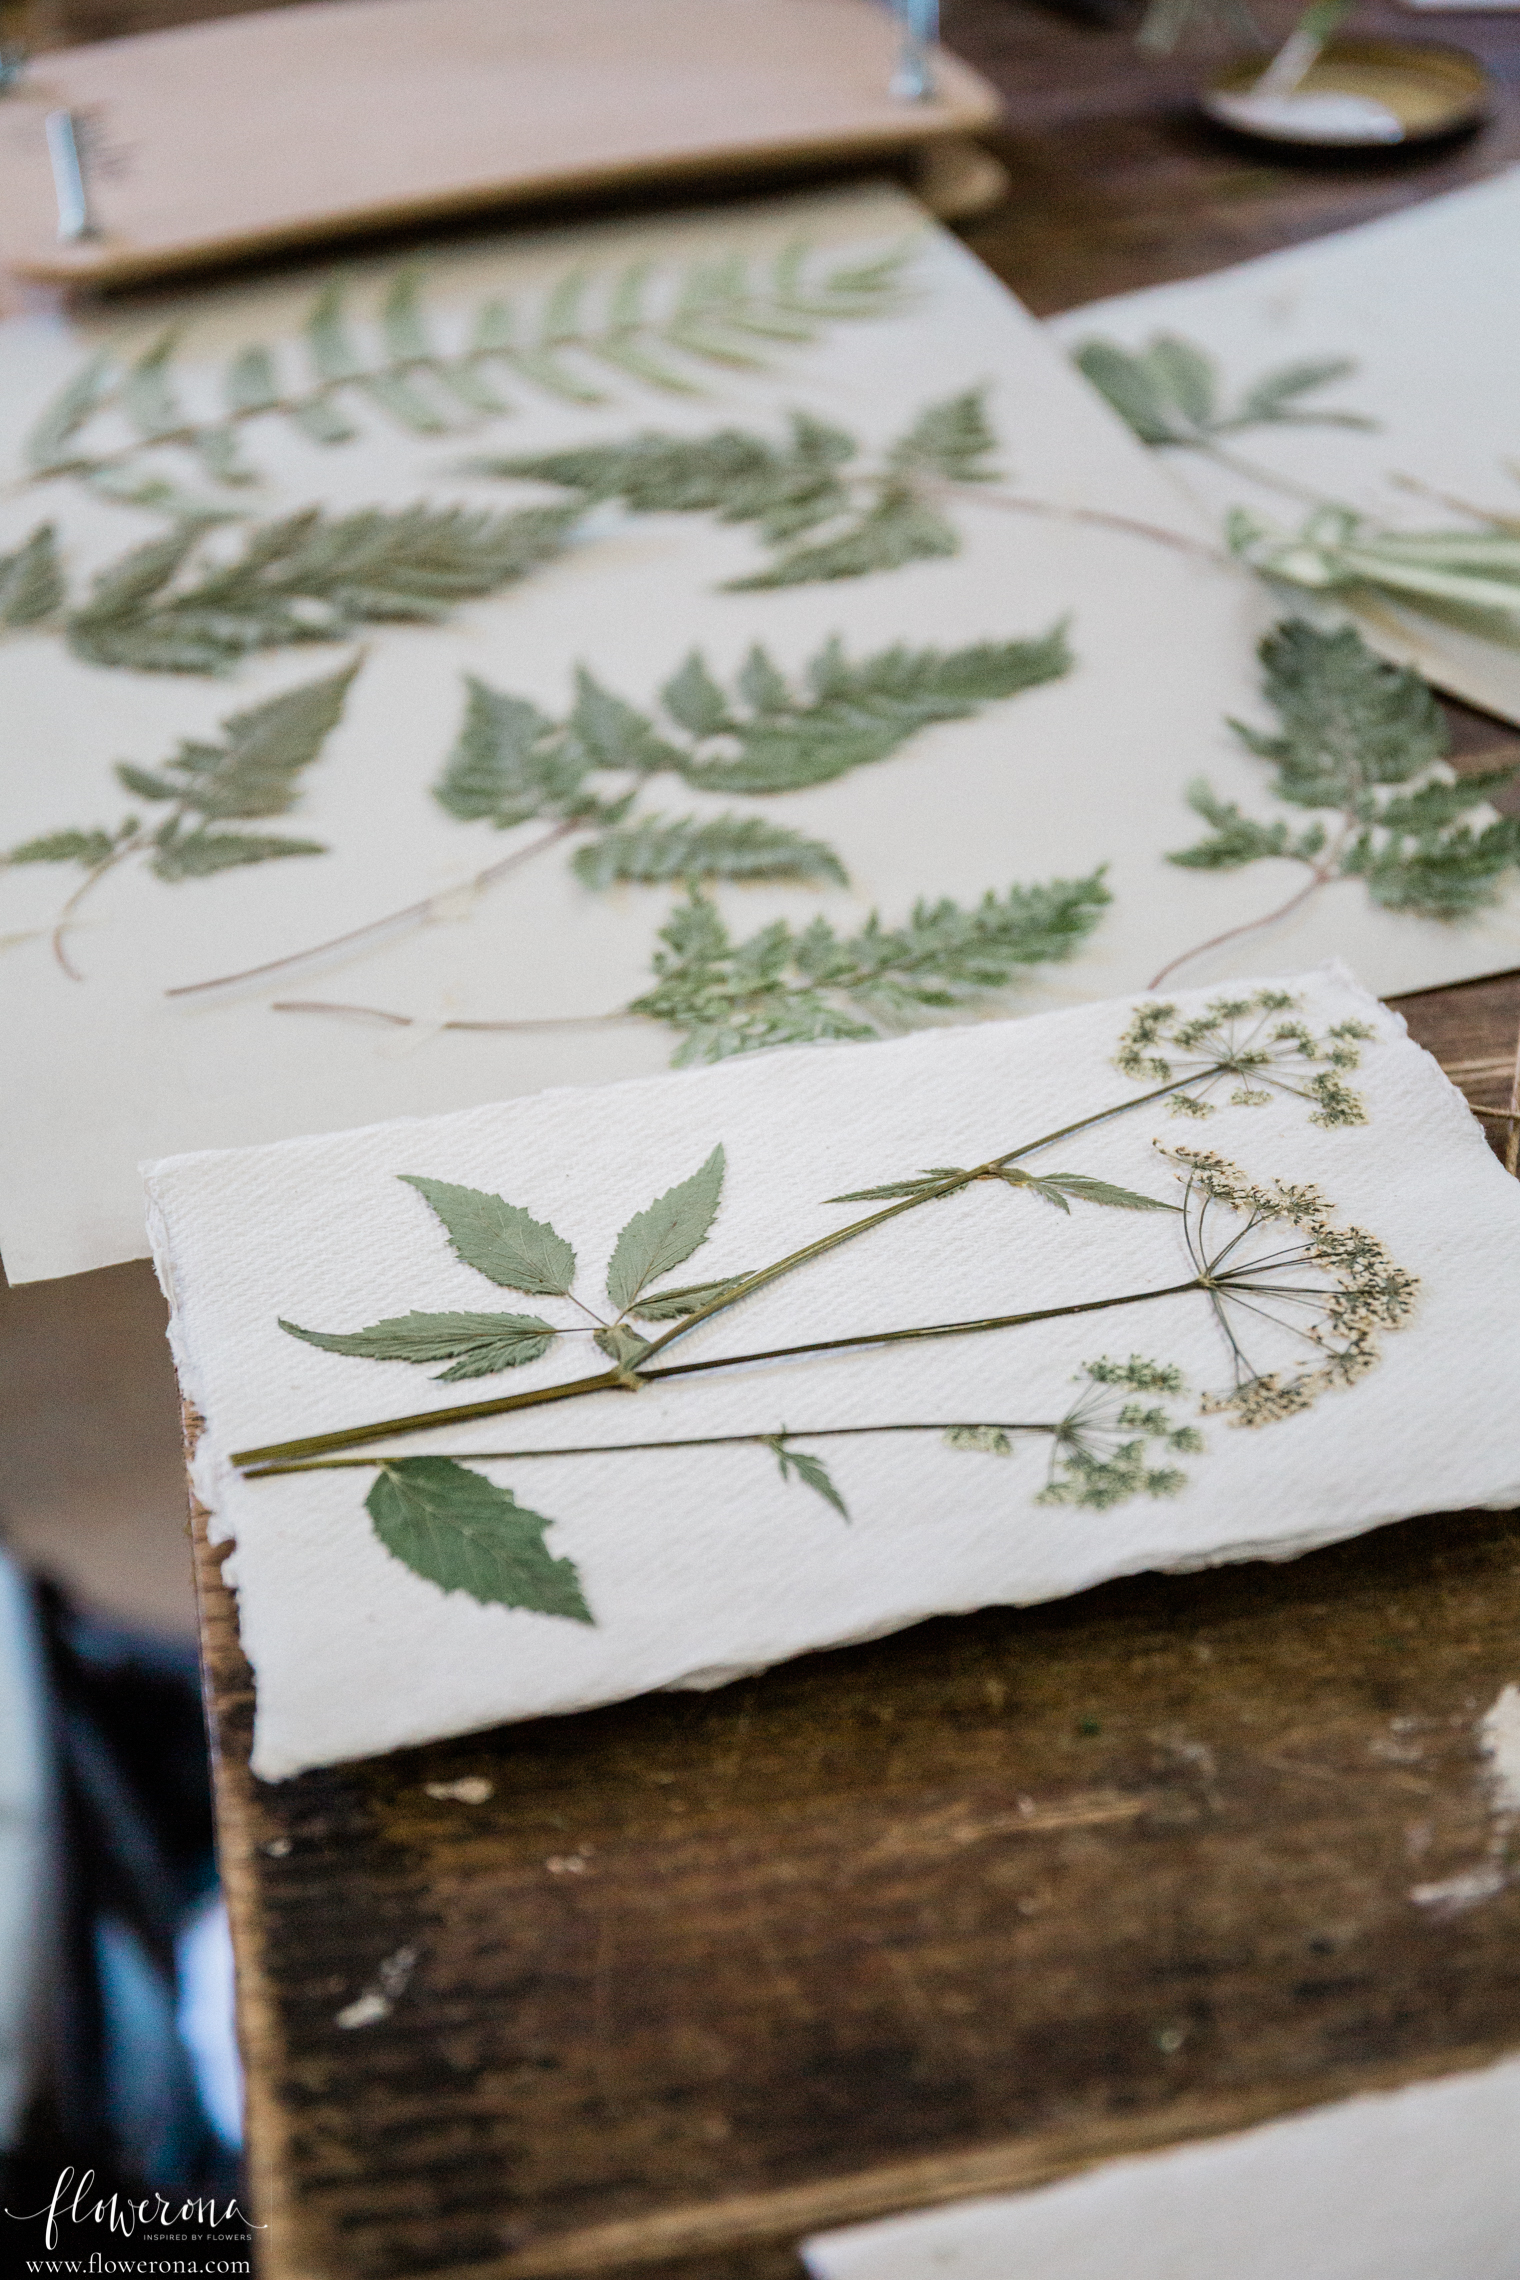 Pressed Flowers & Foliage at the Flower Pressing & Cyanotype Print Workshop with JamJar Edit